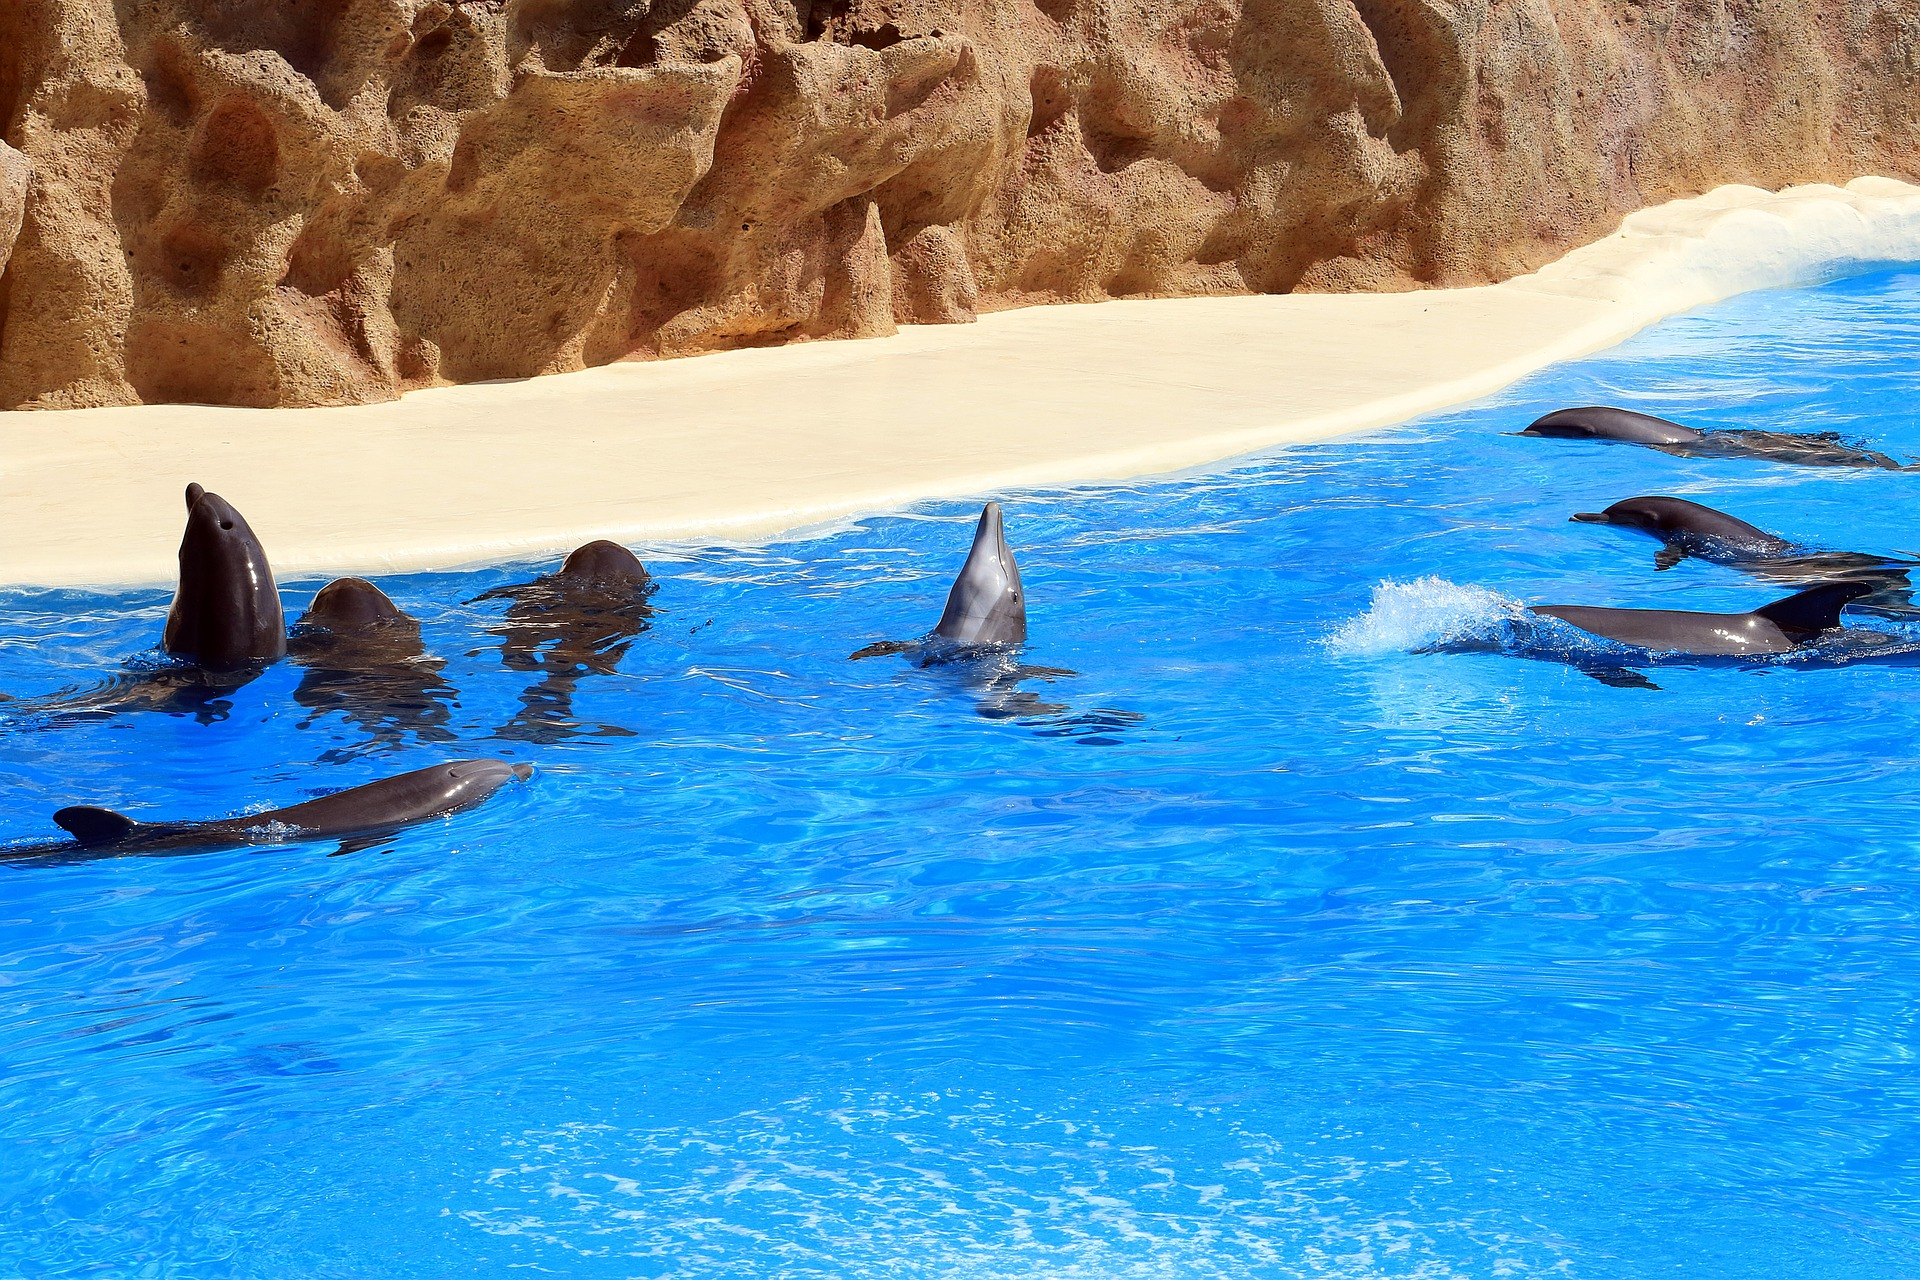 Teneriffa Urlaubsorte ab 88,00€ im Hotel Globales Acuario - Teneriffadeals 1